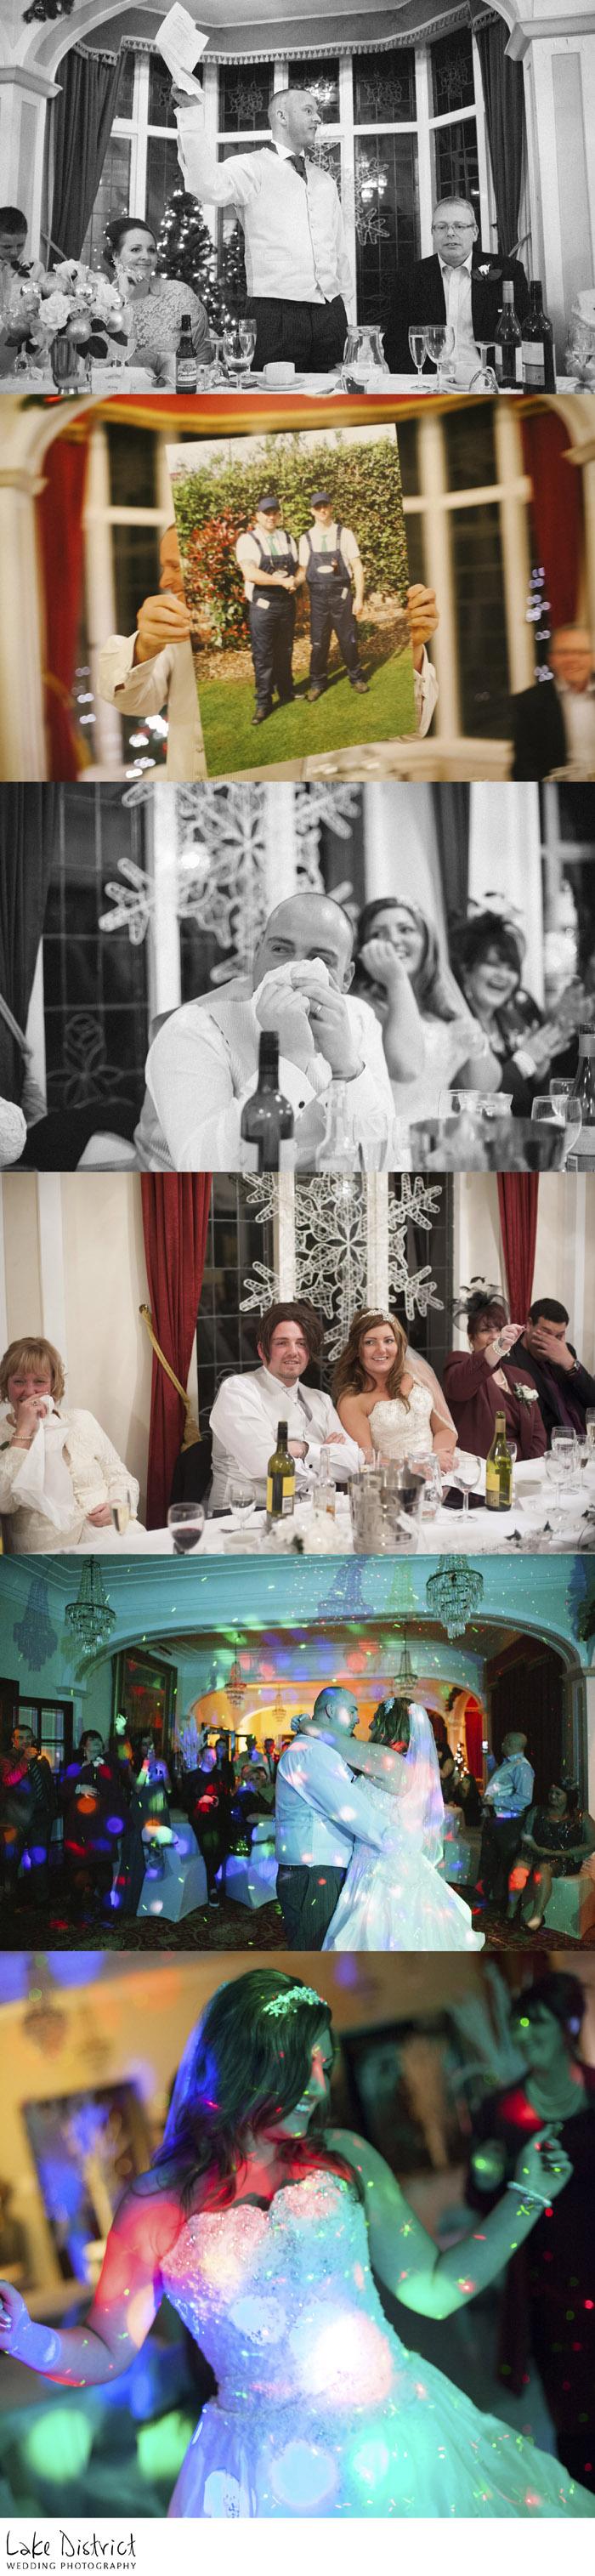 grange over sands and newby bridge wedding photographers